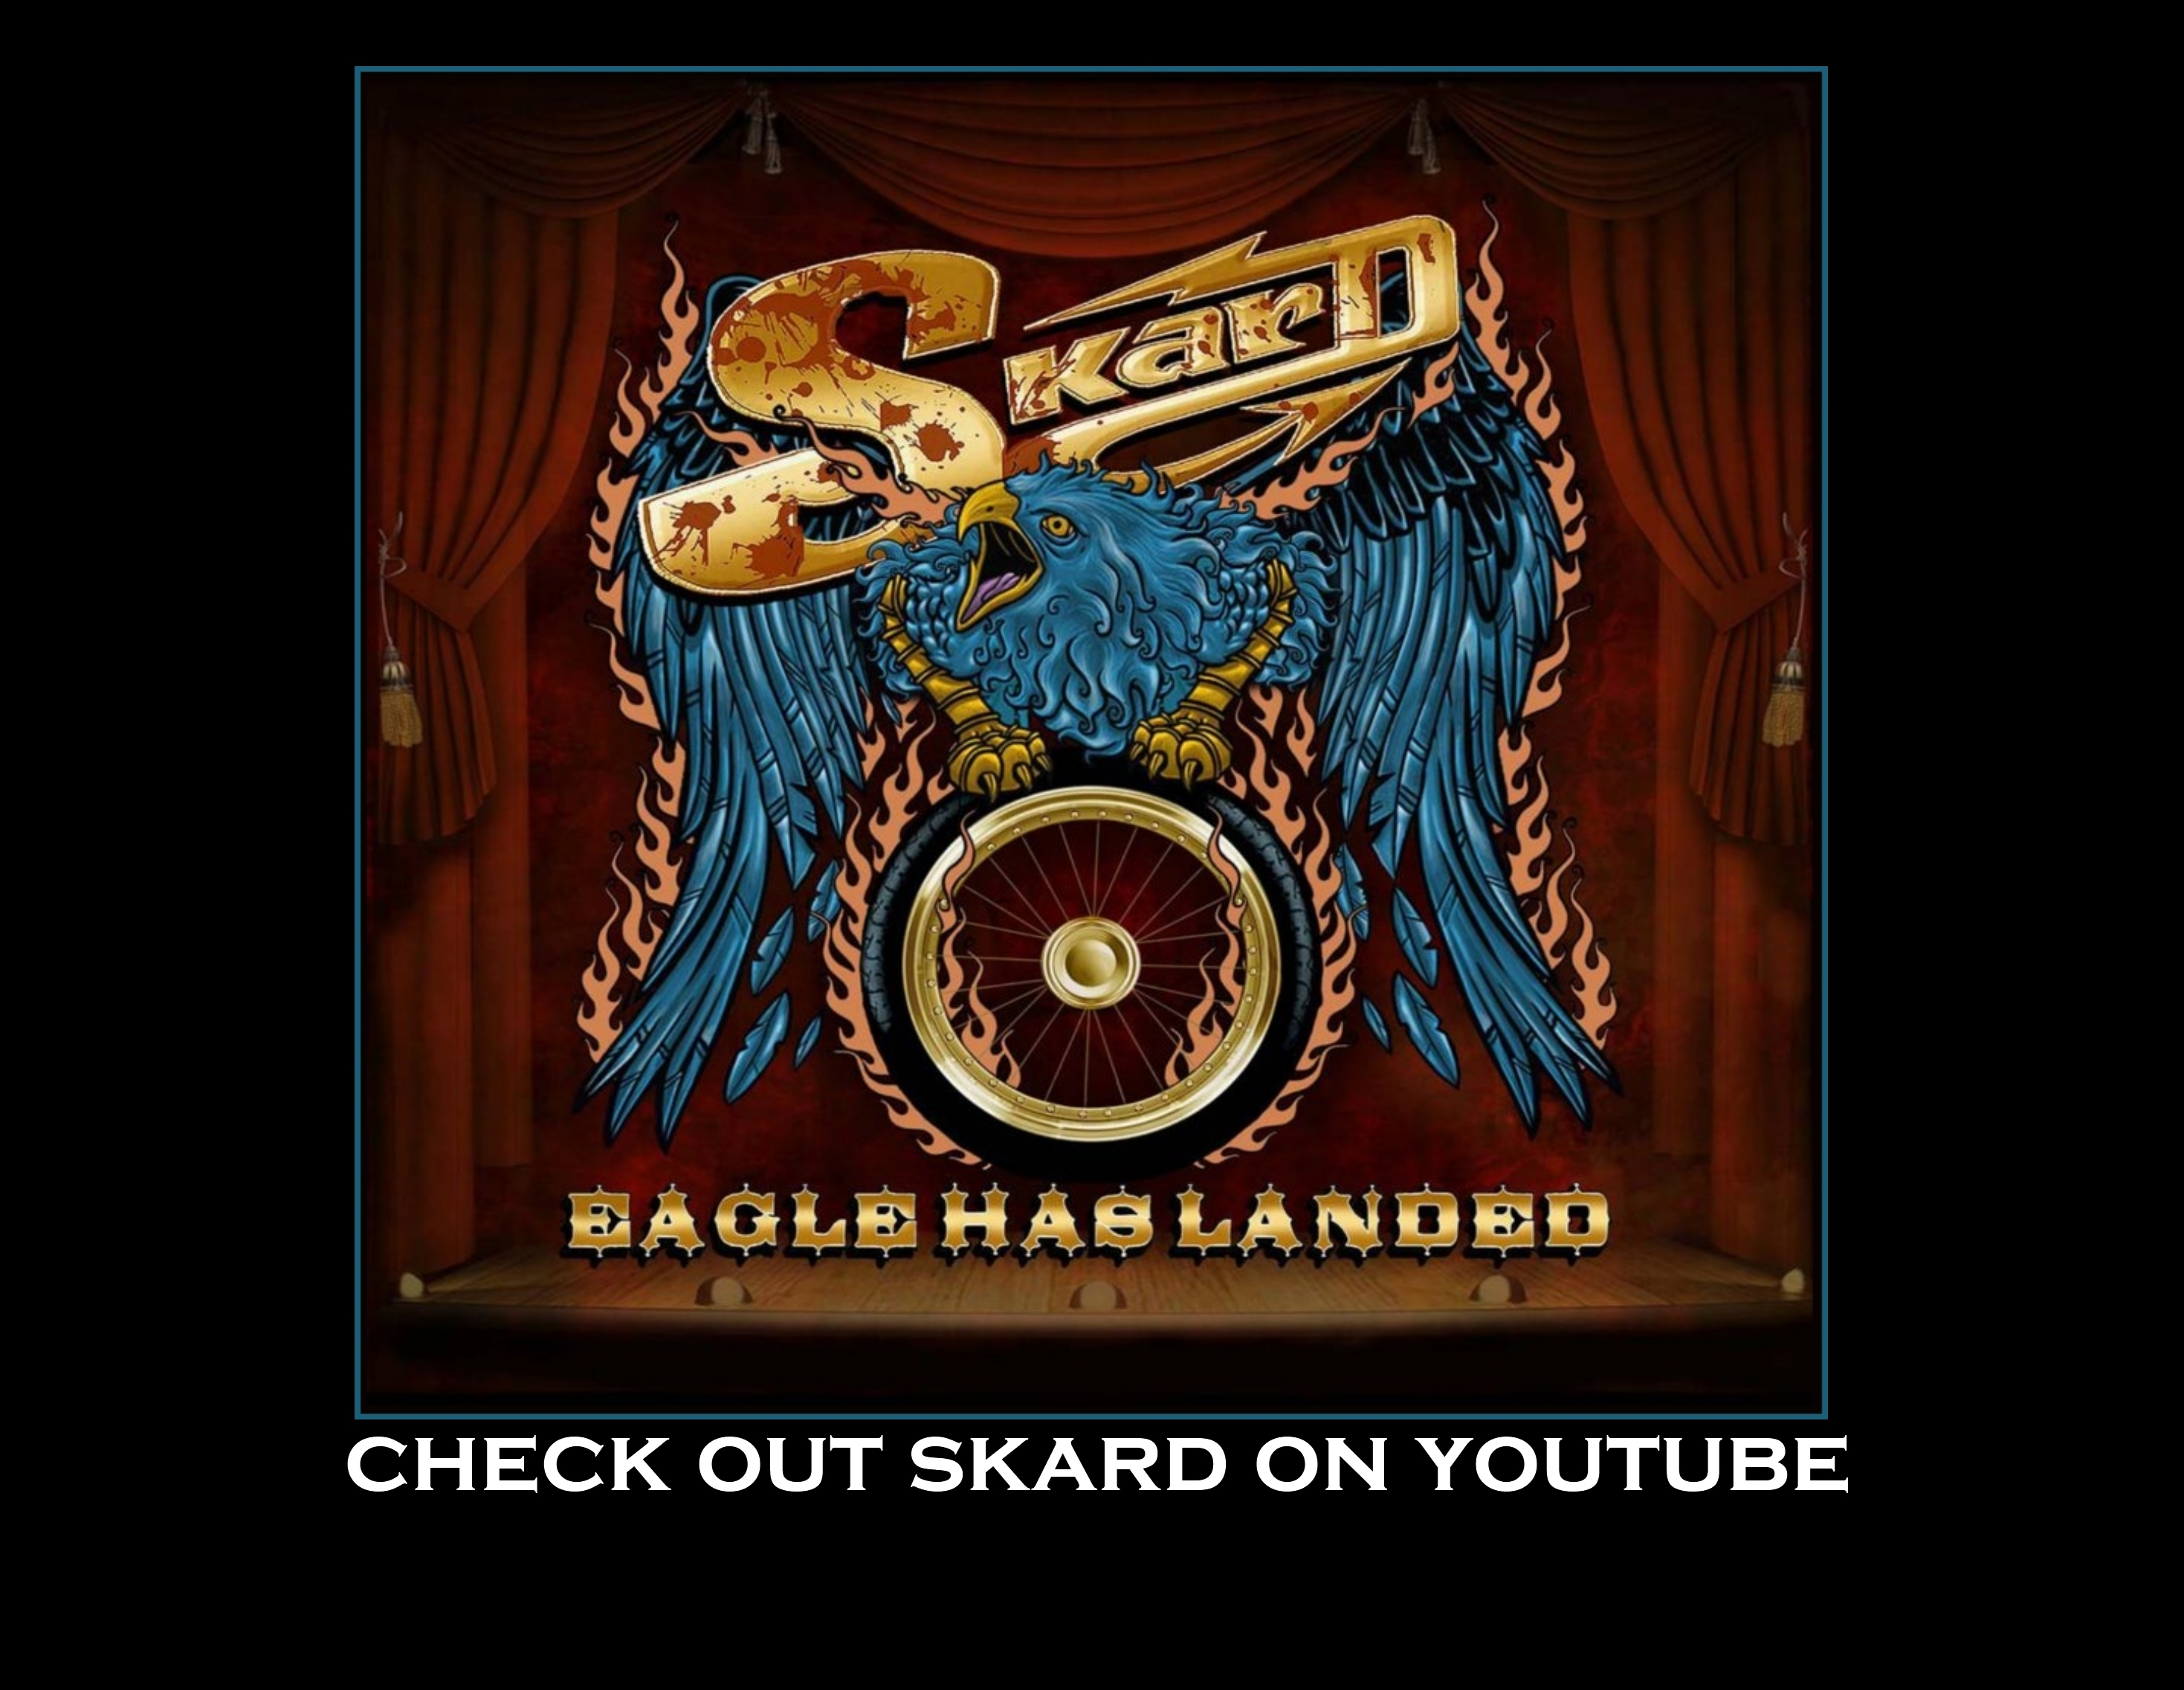 SKARD rock band - True Biker Rock  EAGLE HAS LANDED Album